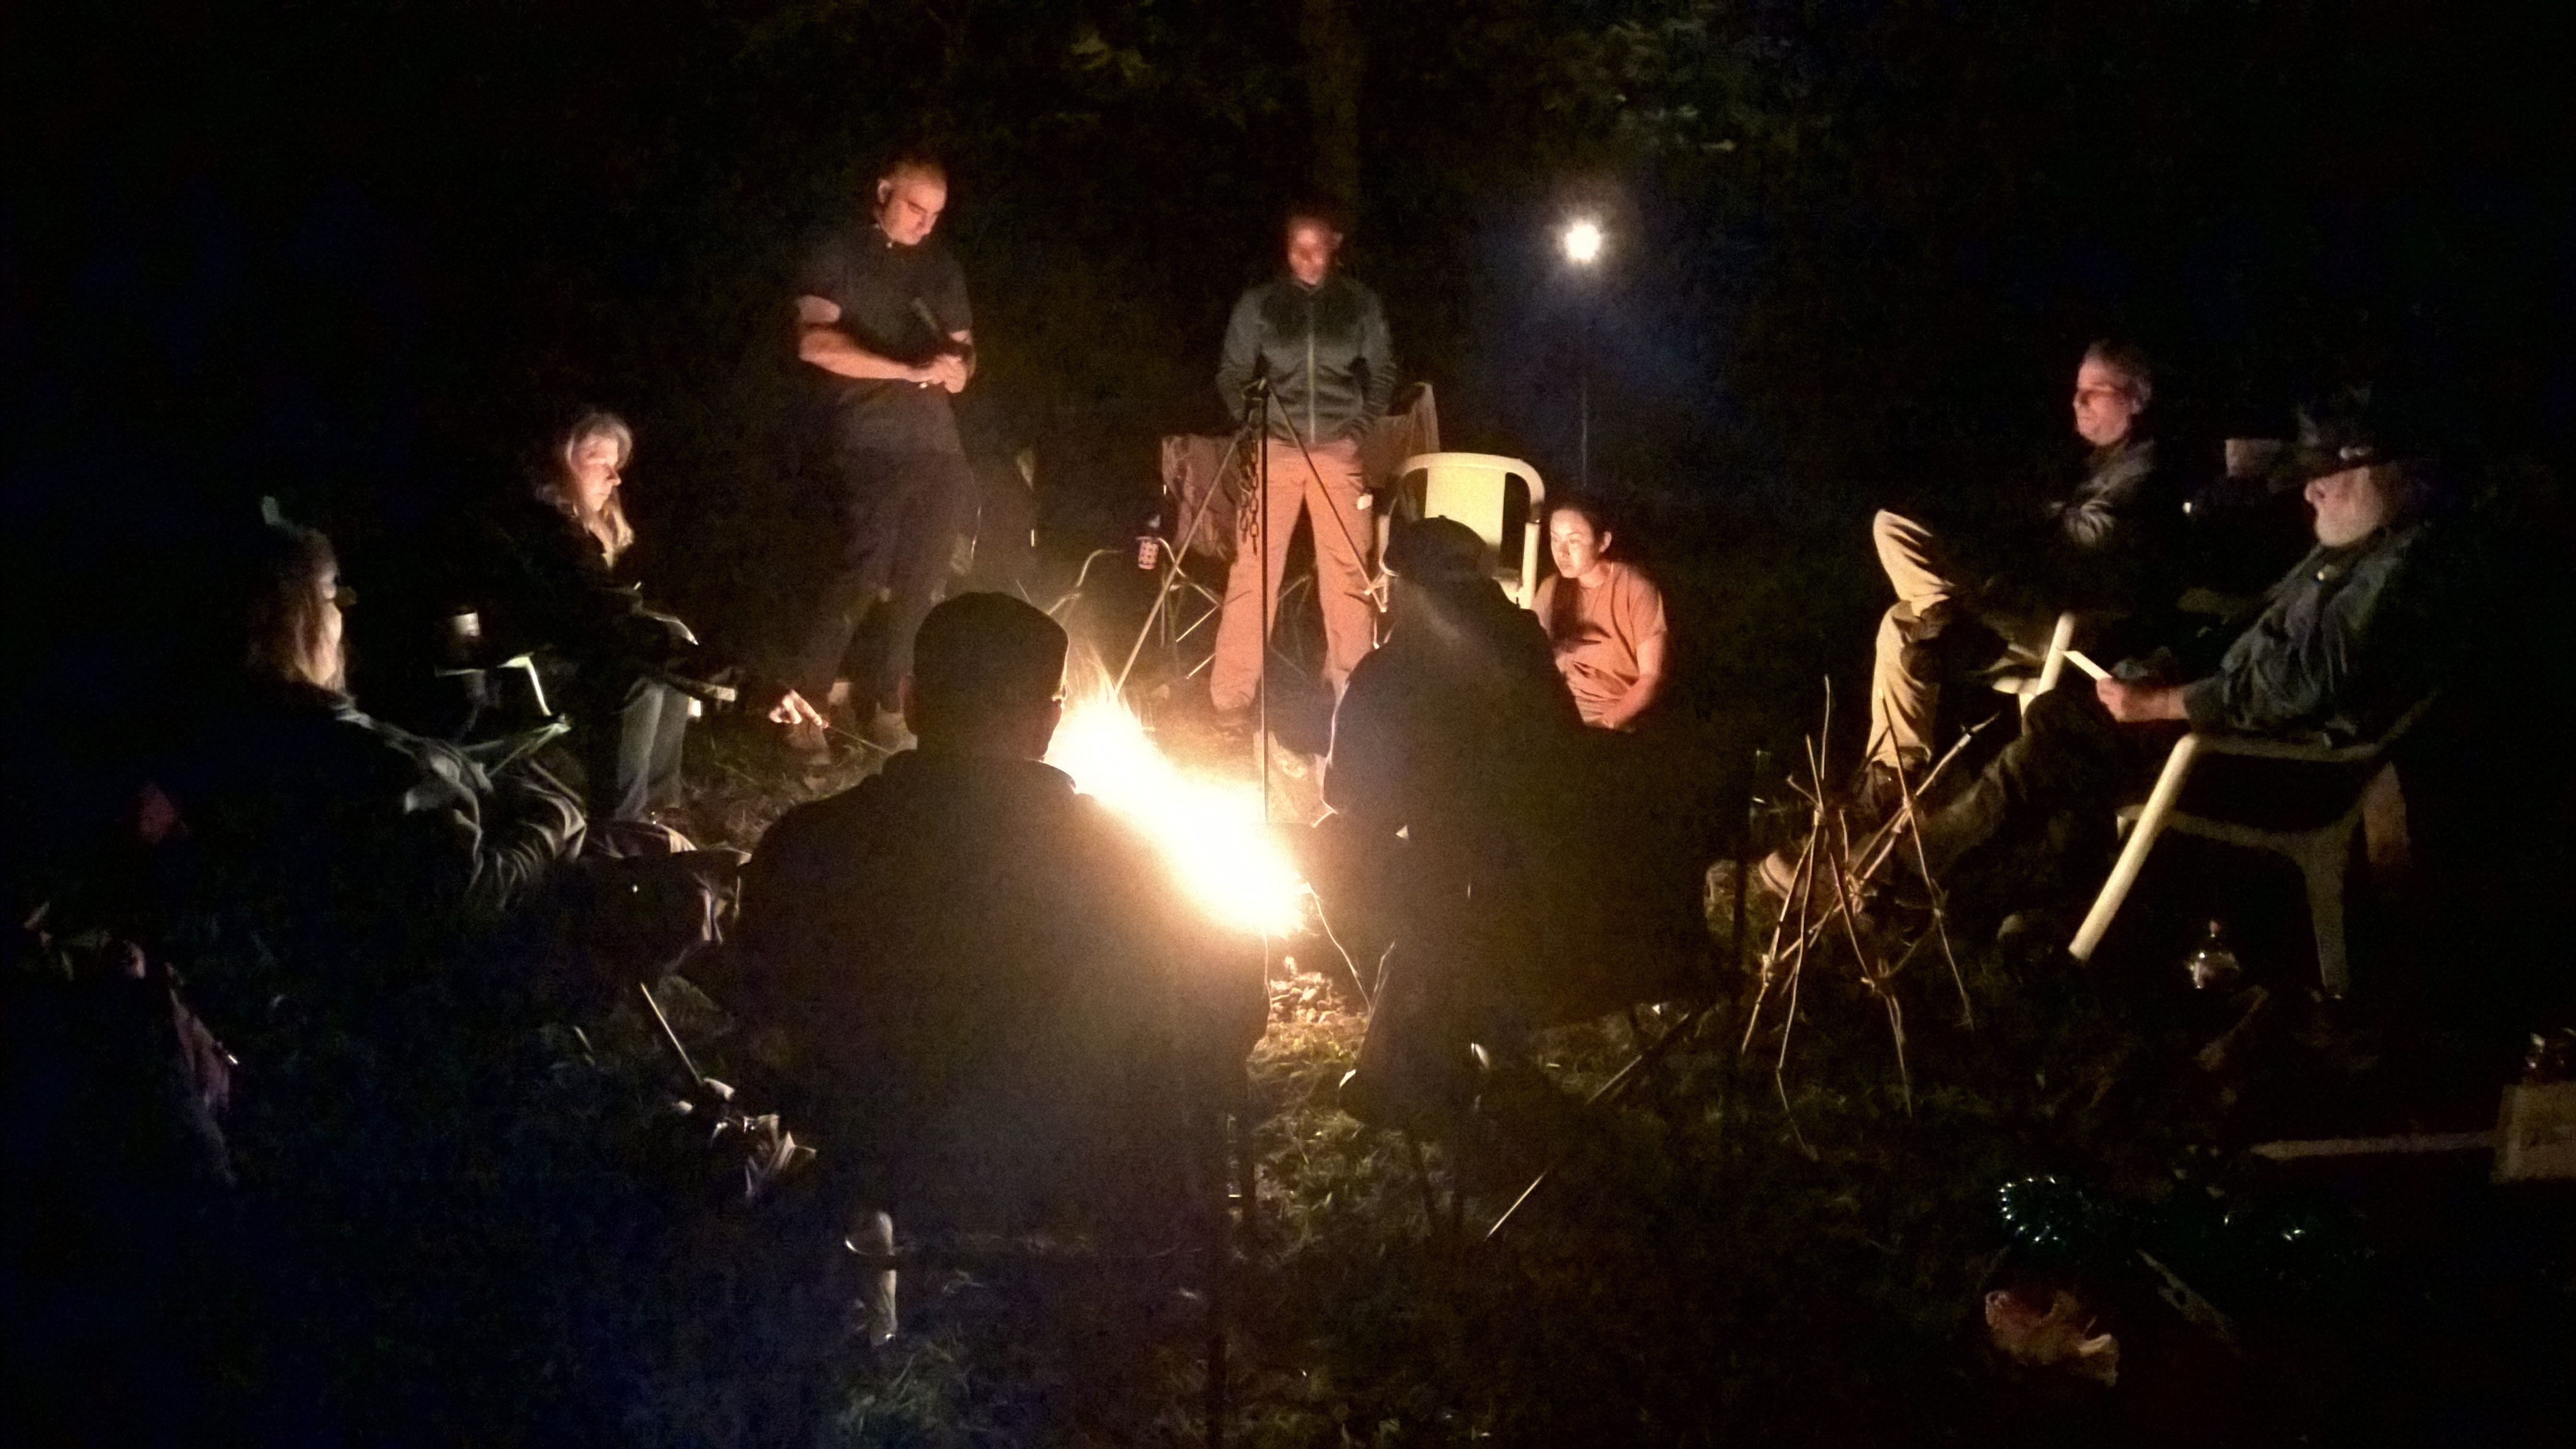 Southeastern Pennsylvania survivalist and bushcraft